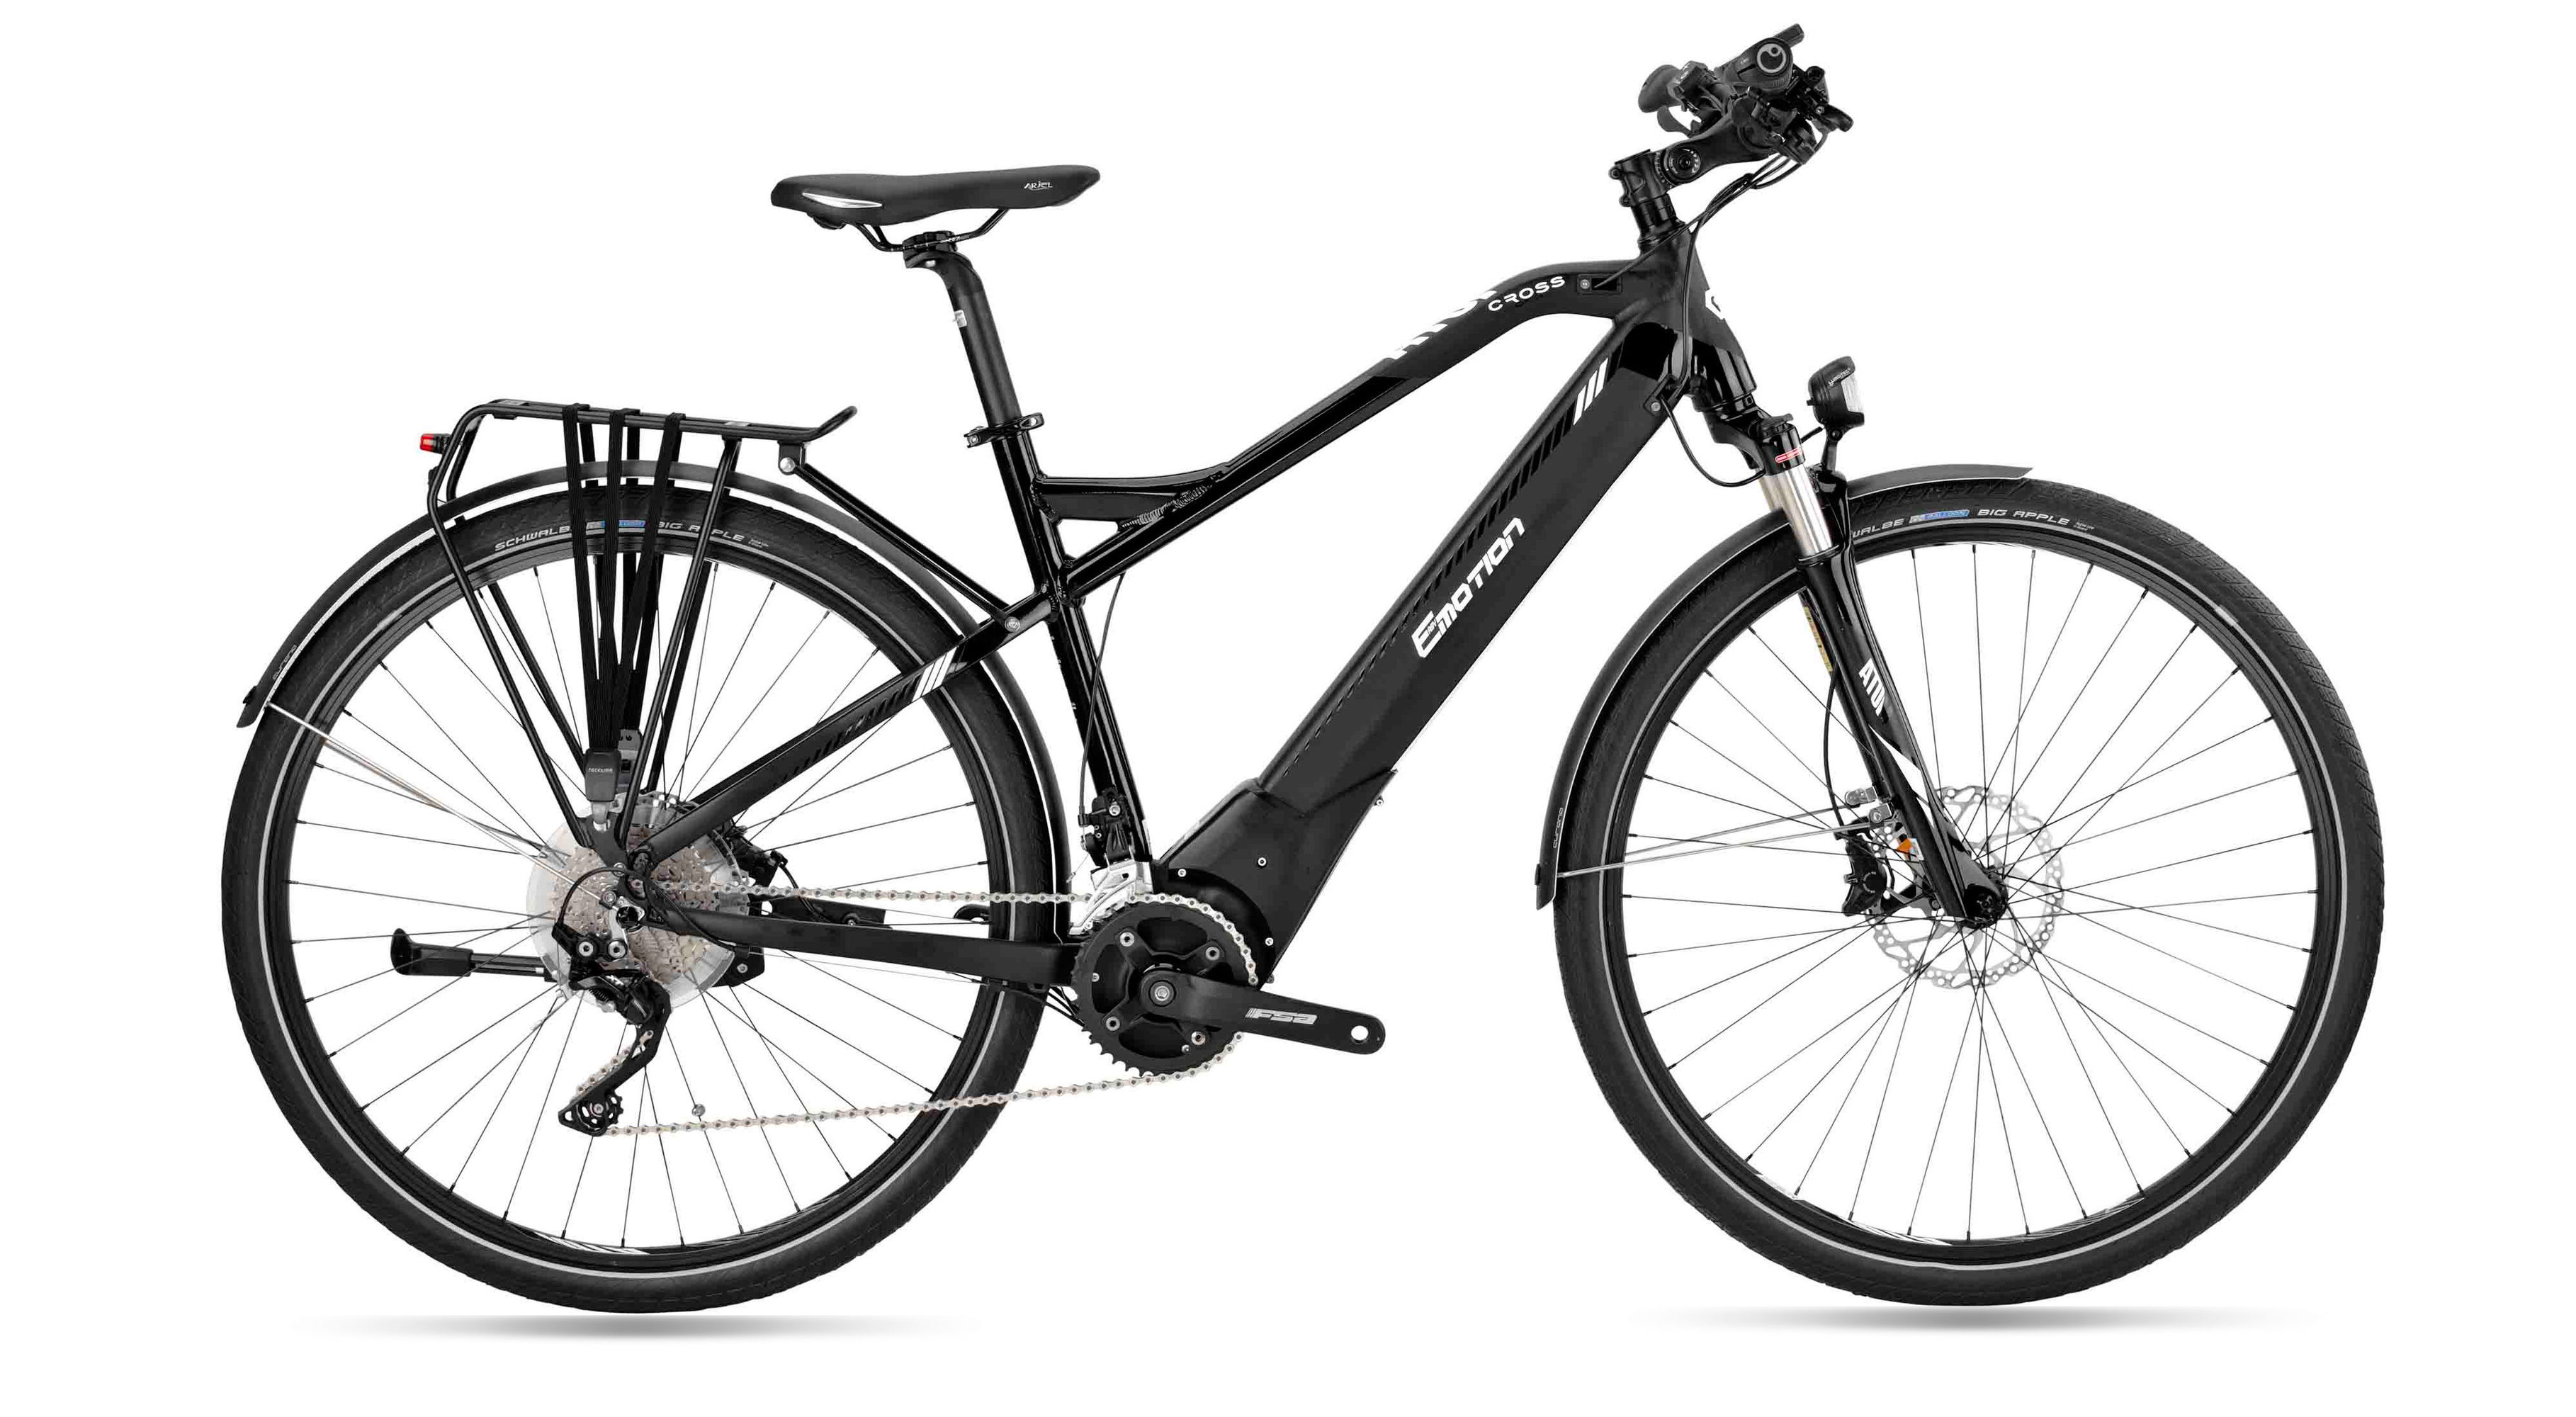 greenbike pesaro-BH Bikes-bici elettriche motore centrale-Atom Cross Pro